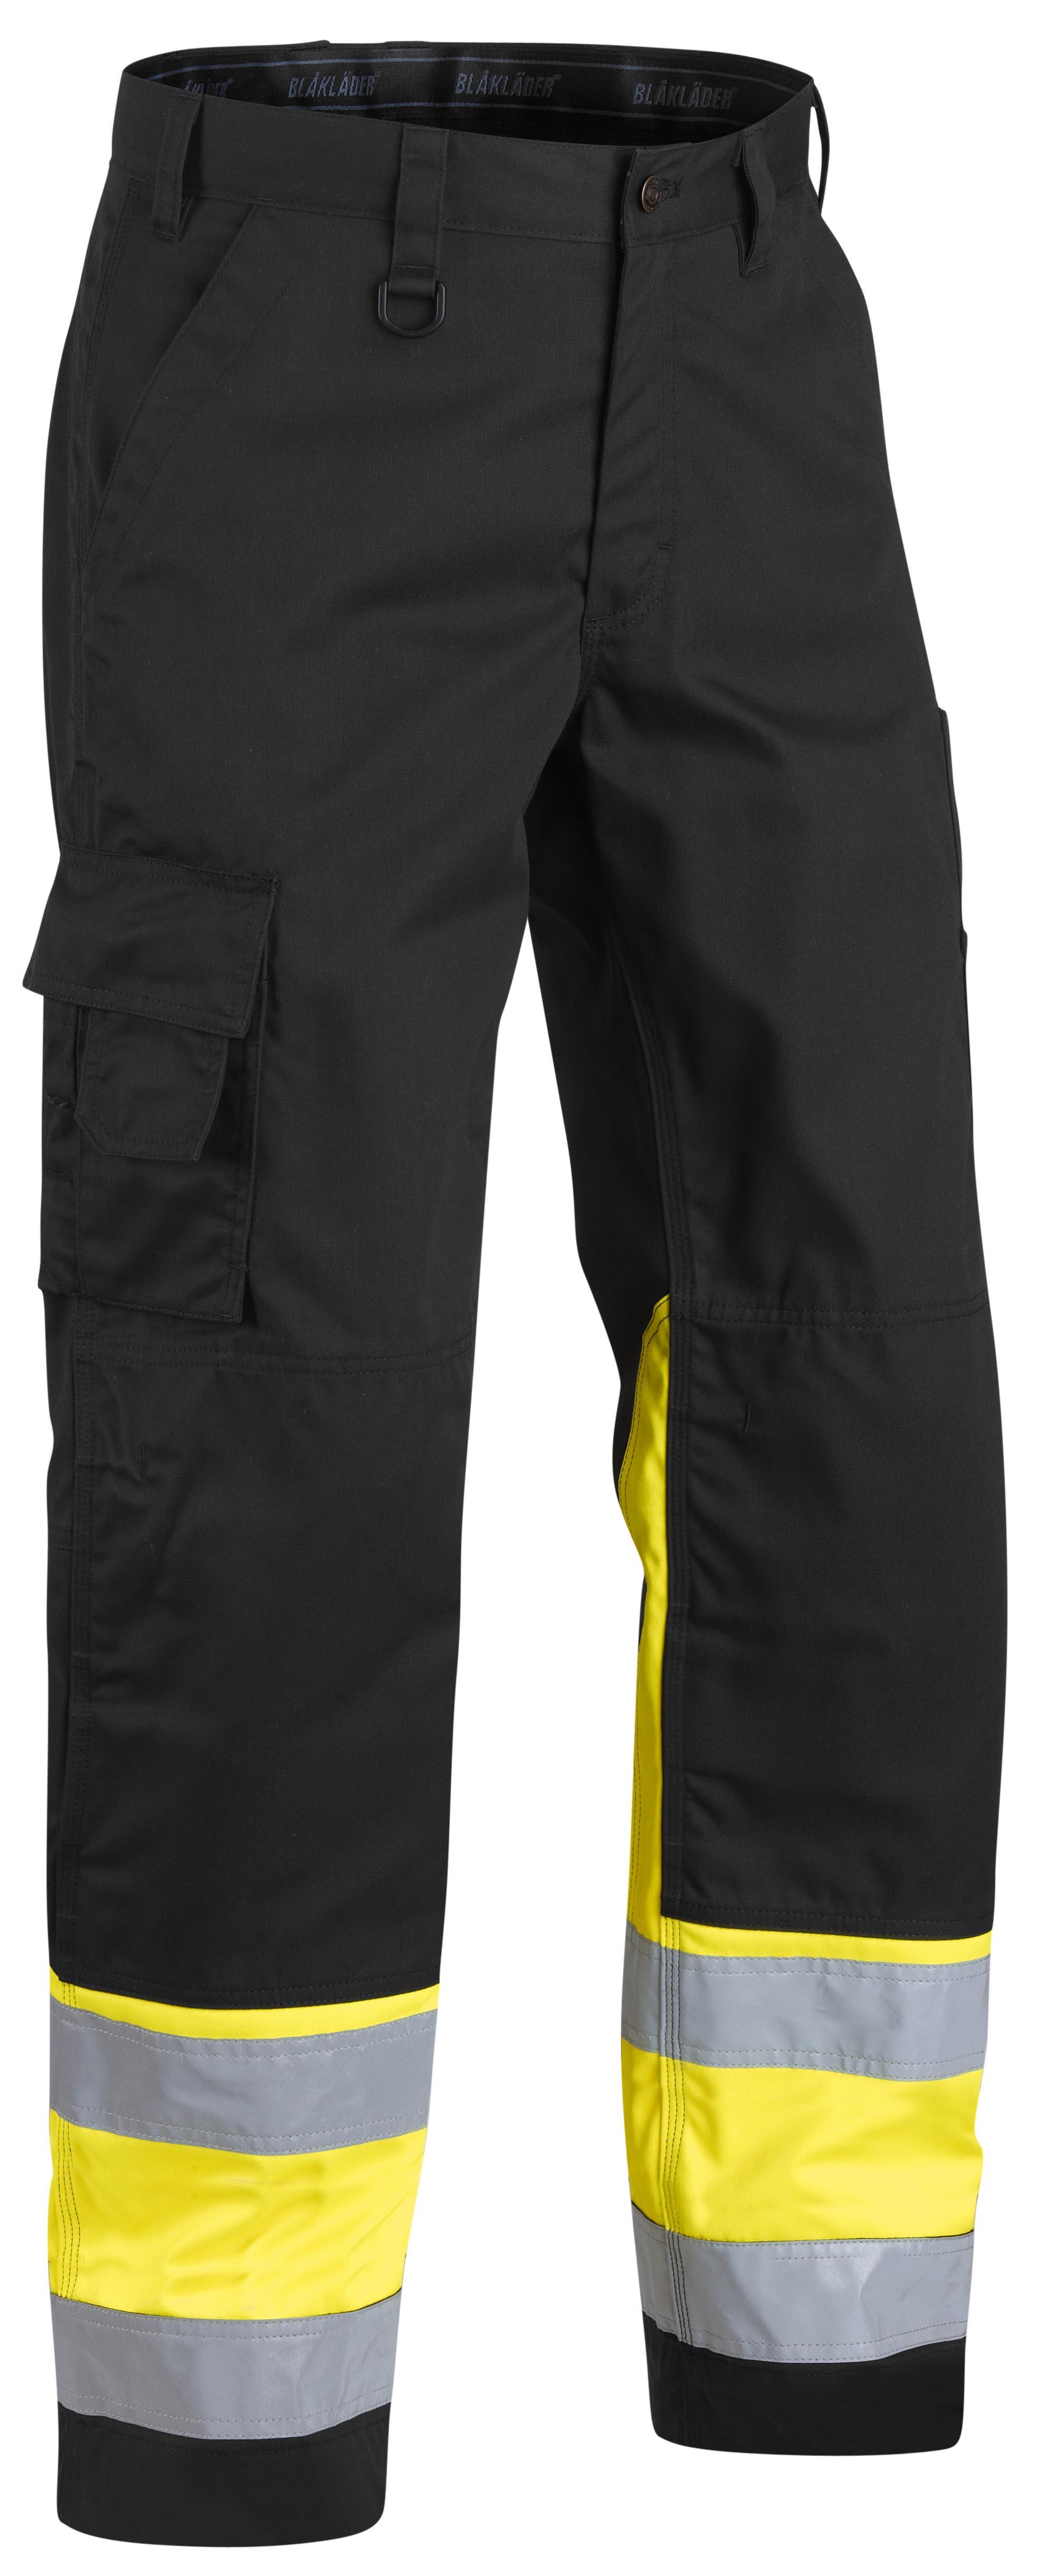 pantalon haute visibilit pantalon de travail. Black Bedroom Furniture Sets. Home Design Ideas